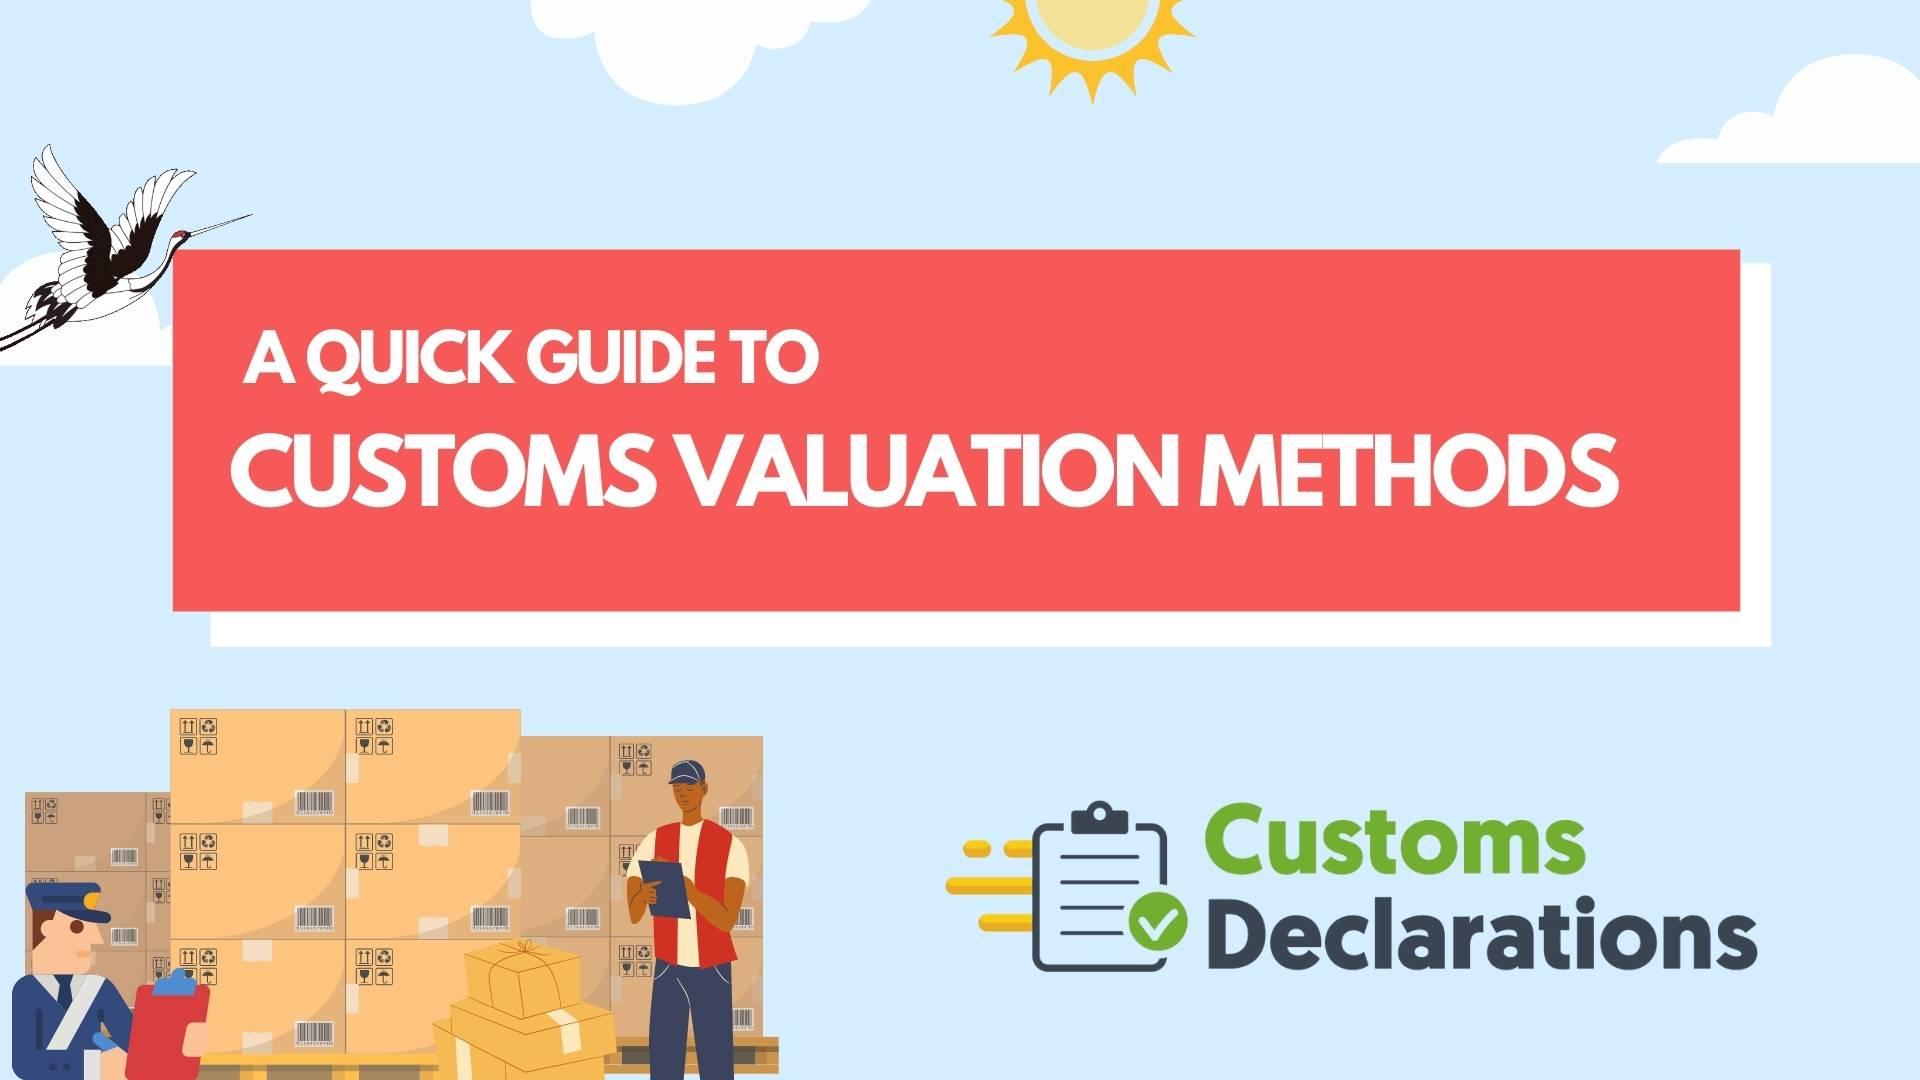 Customs Valuation Methods